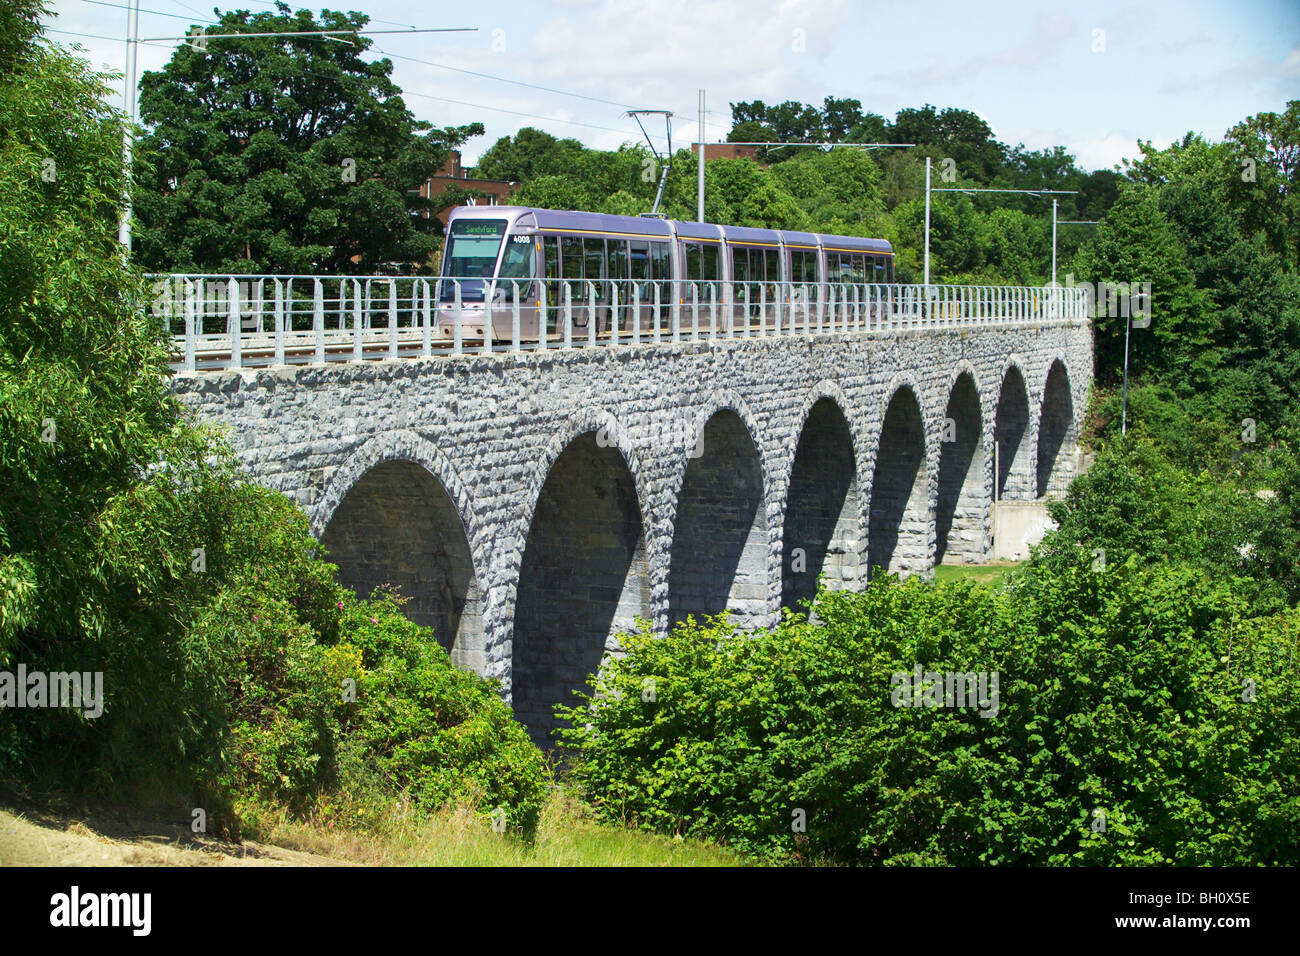 LUAS tram crossing Milltown Bridge, Dublin, Ireland Stock Photo